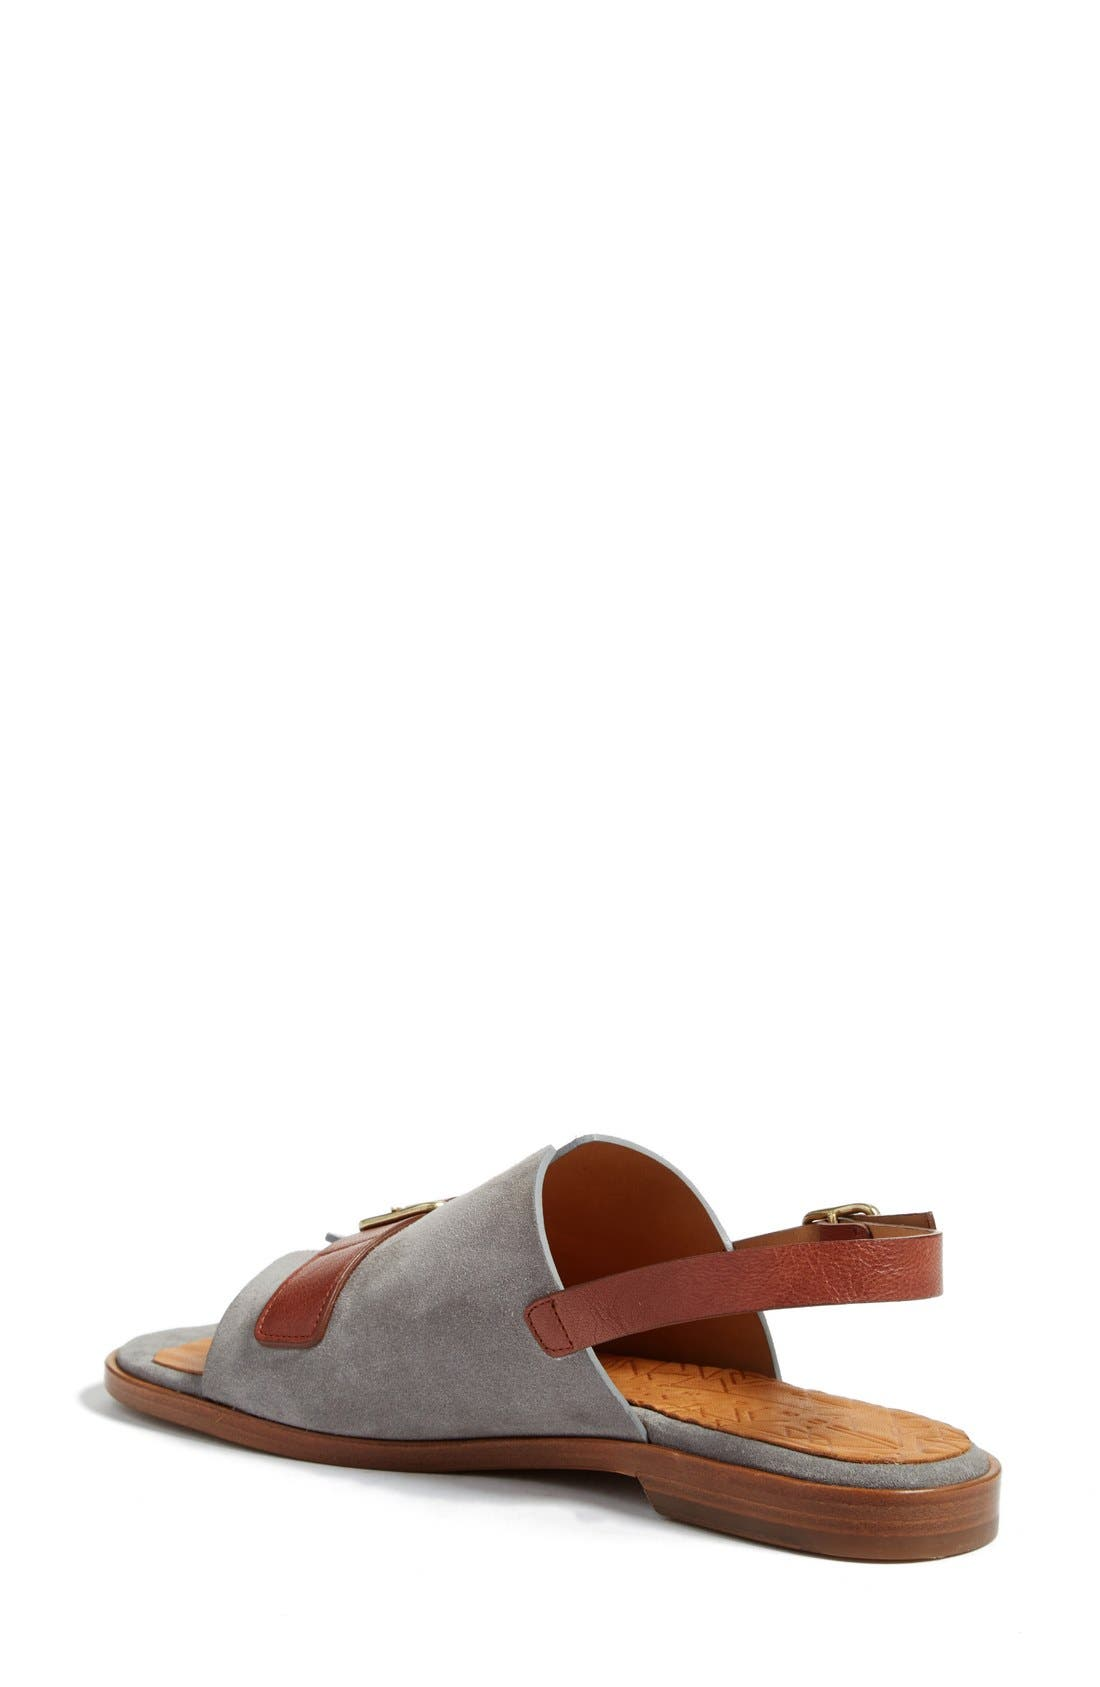 Querete Slingback Sandal,                             Alternate thumbnail 2, color,                             Stone/ Brown